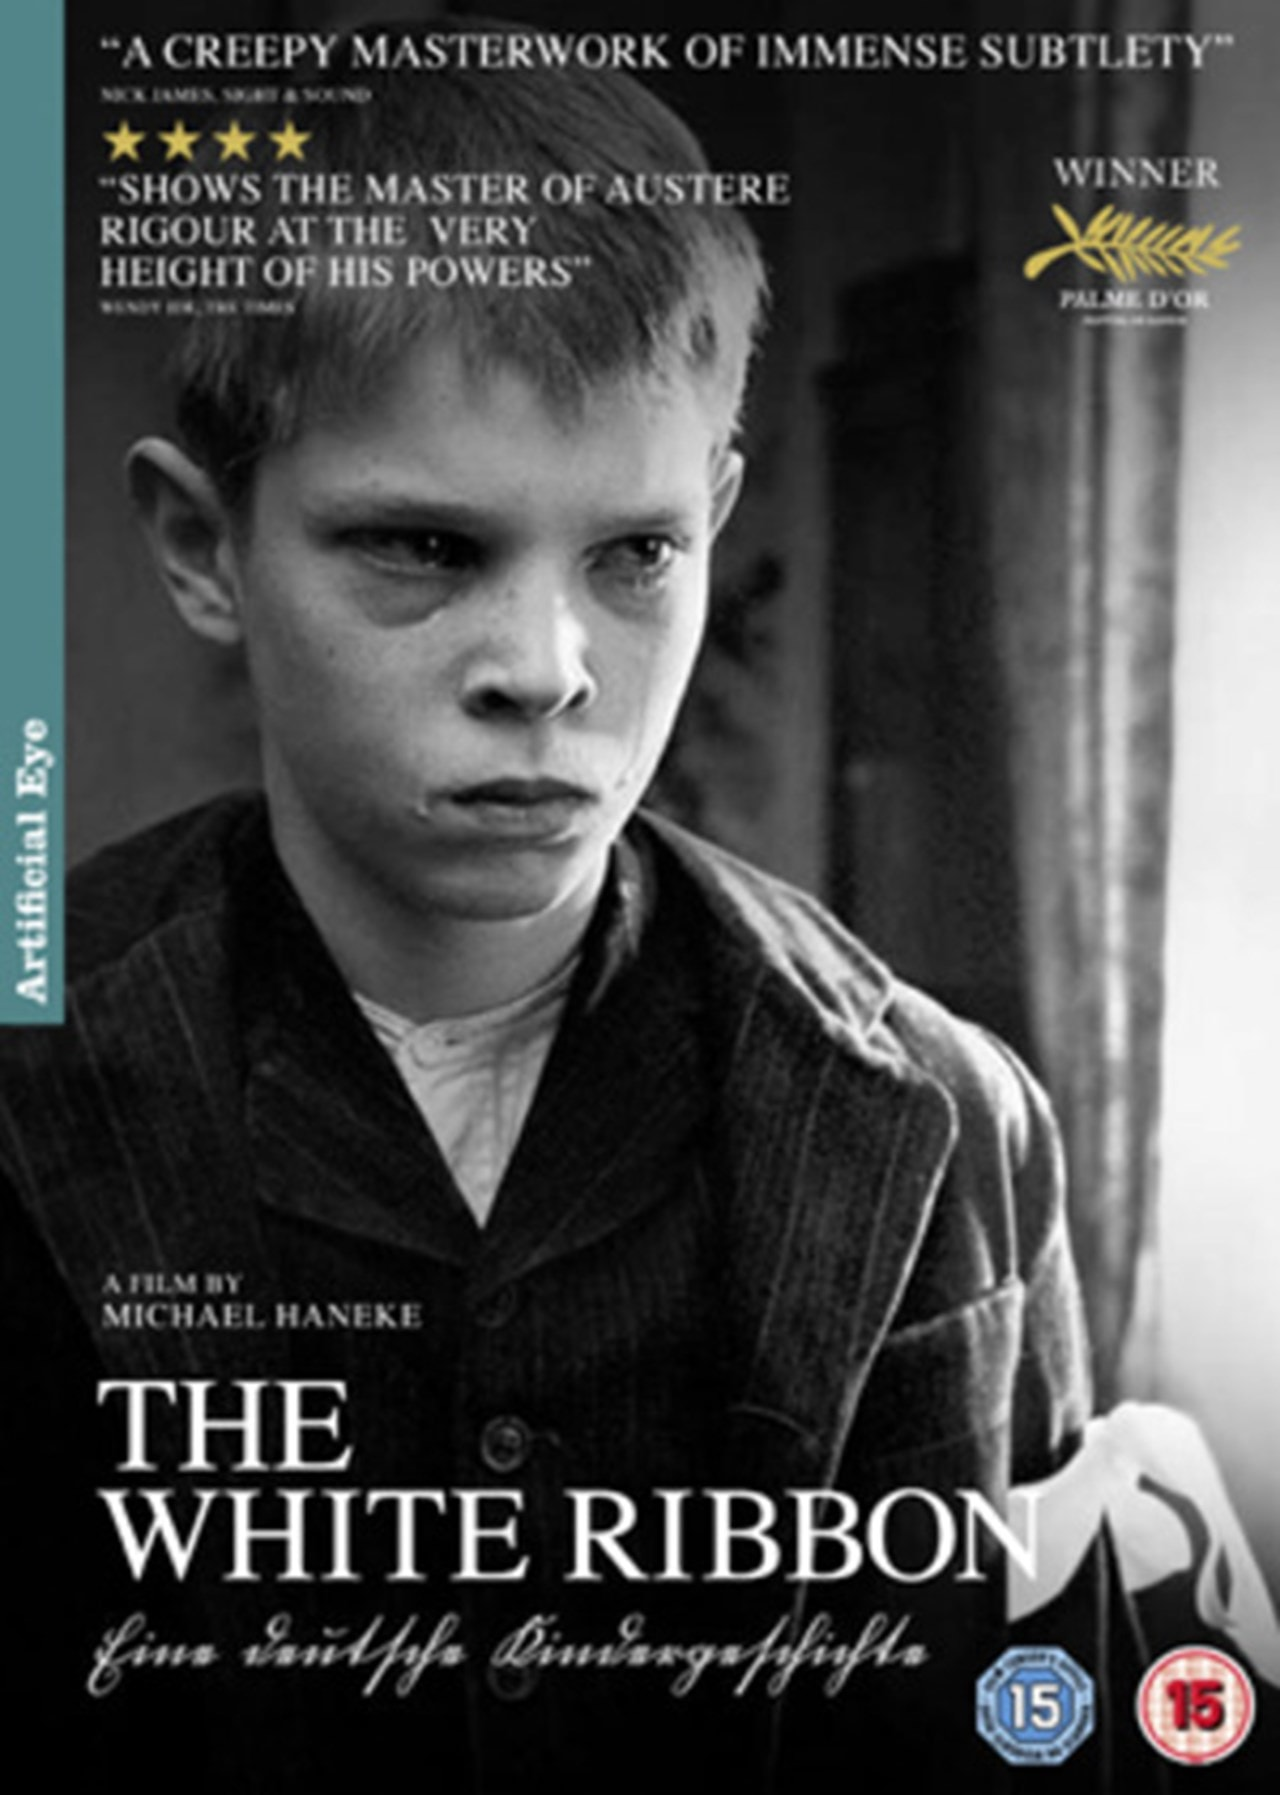 The White Ribbon - 1